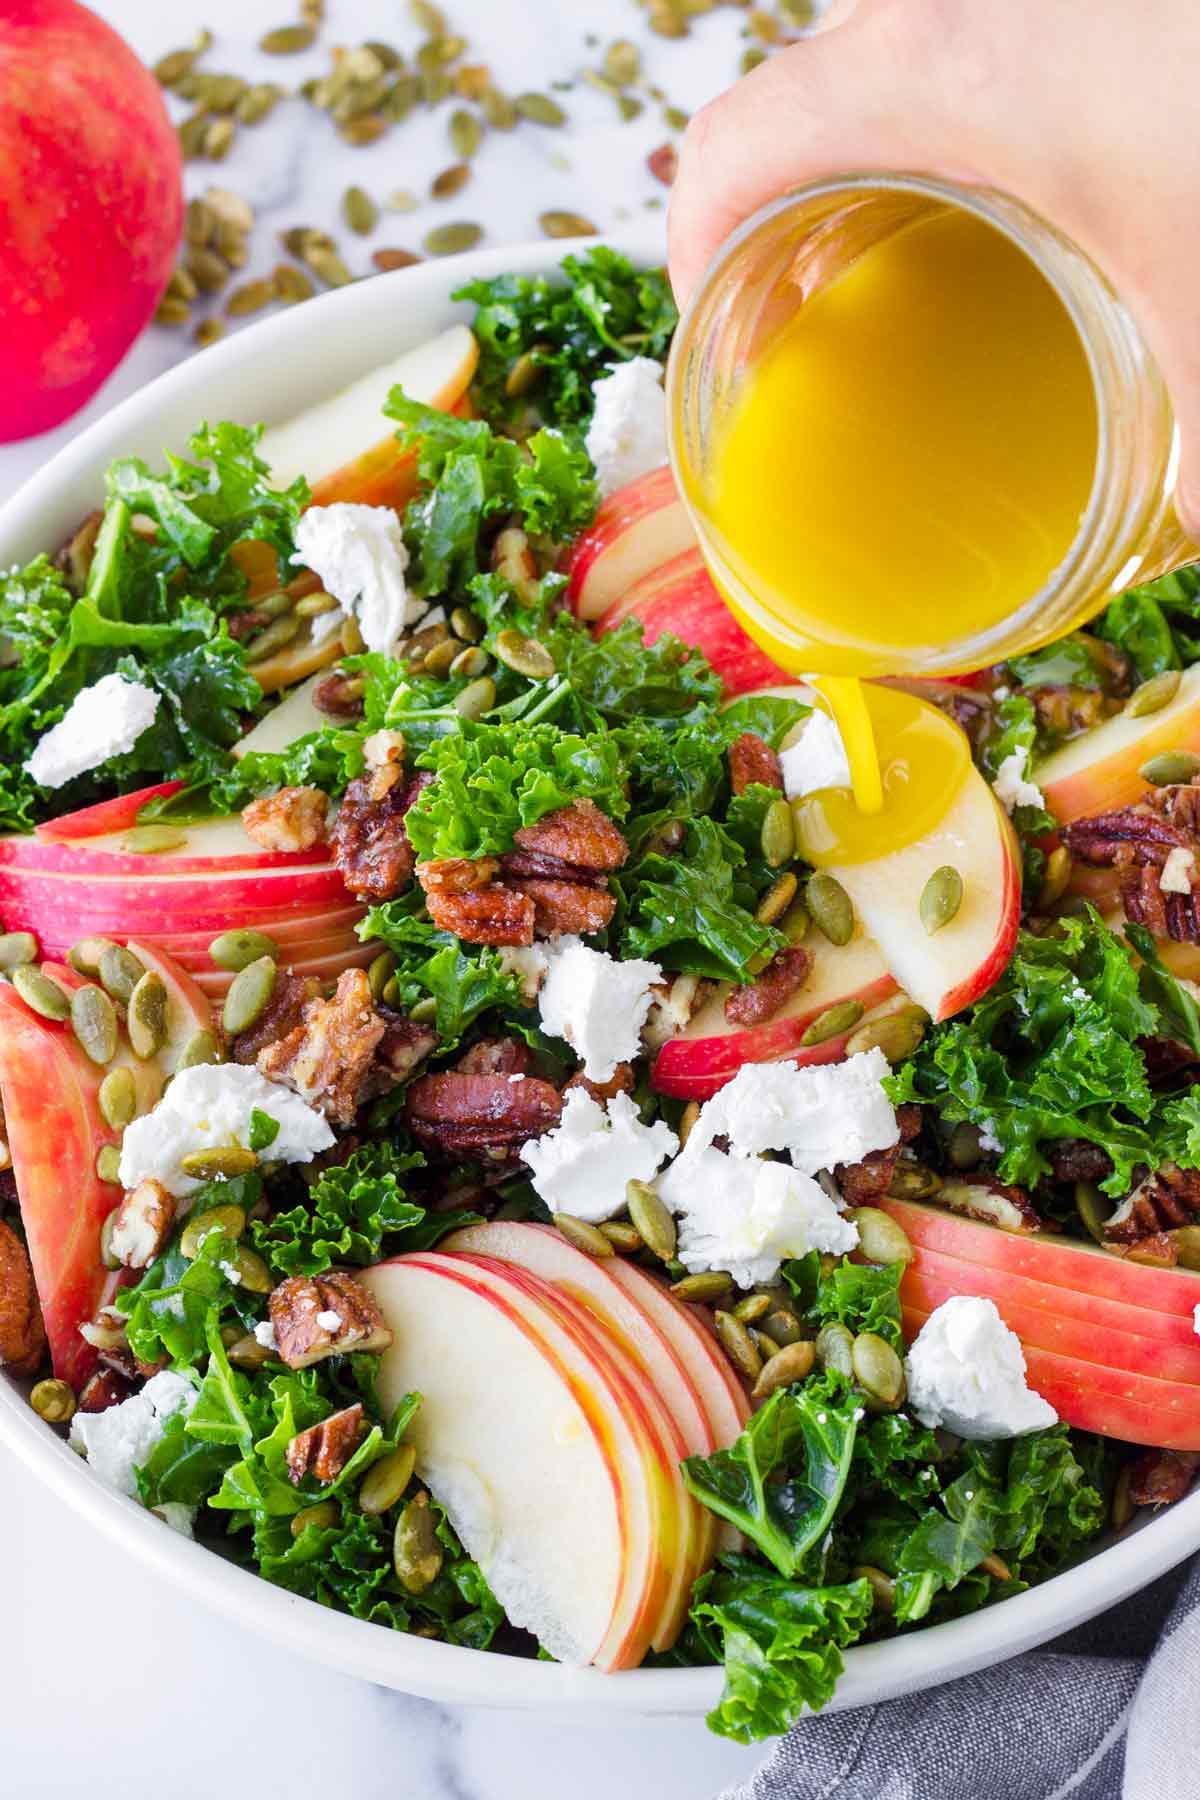 drizzling vinaigrette on top of prepared apple kale salad